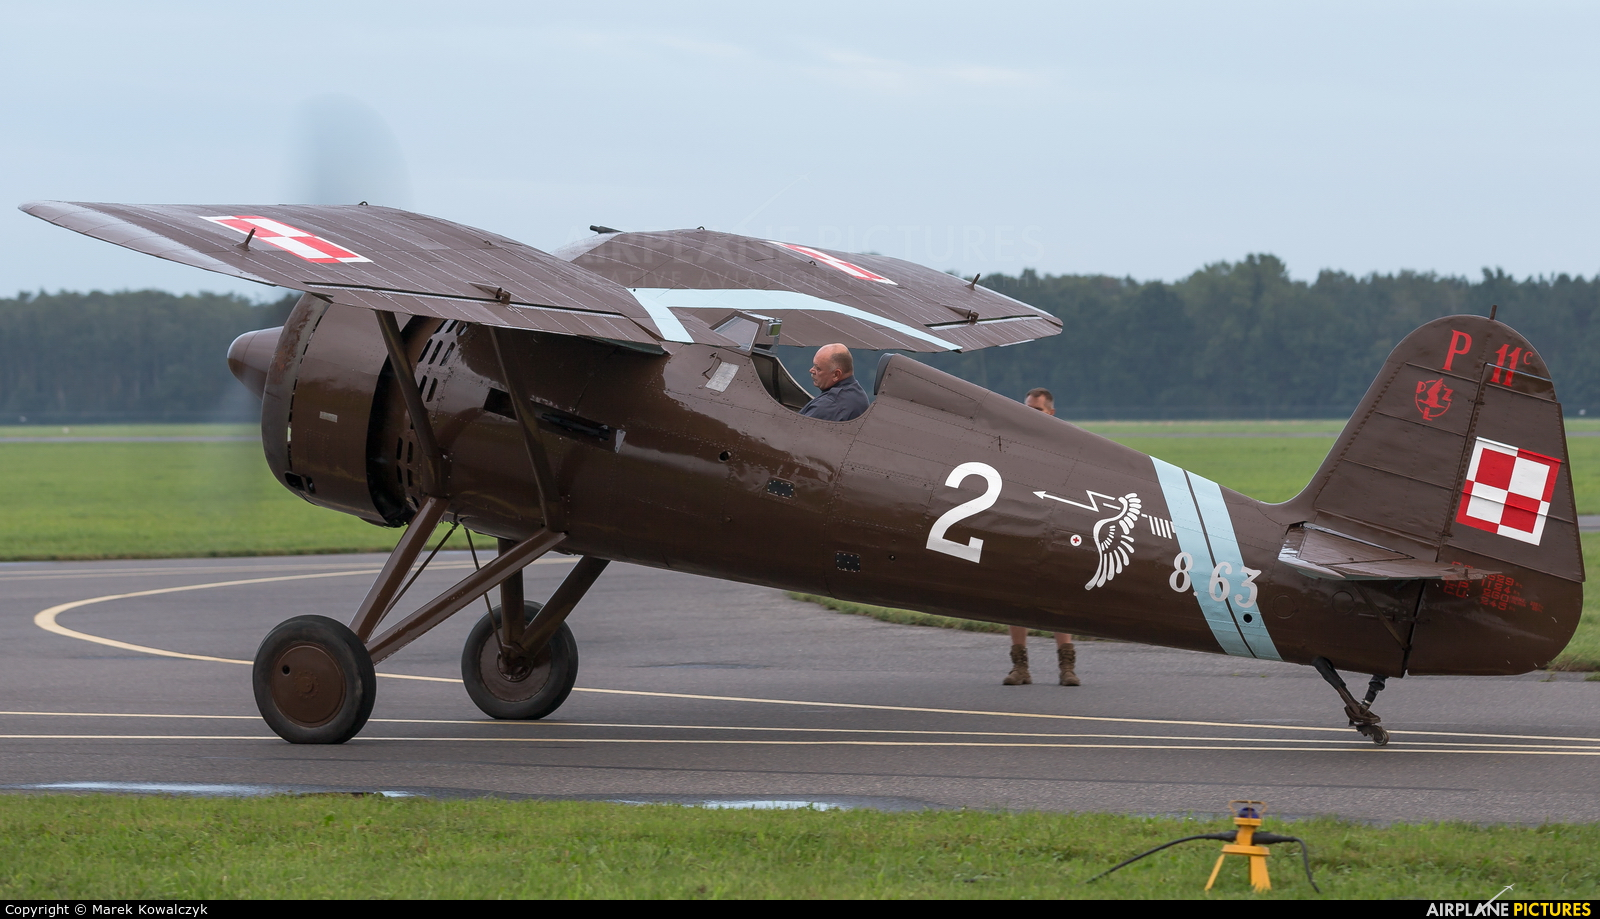 Museum of Polish Aviation 8.63 aircraft at Radom - Sadków